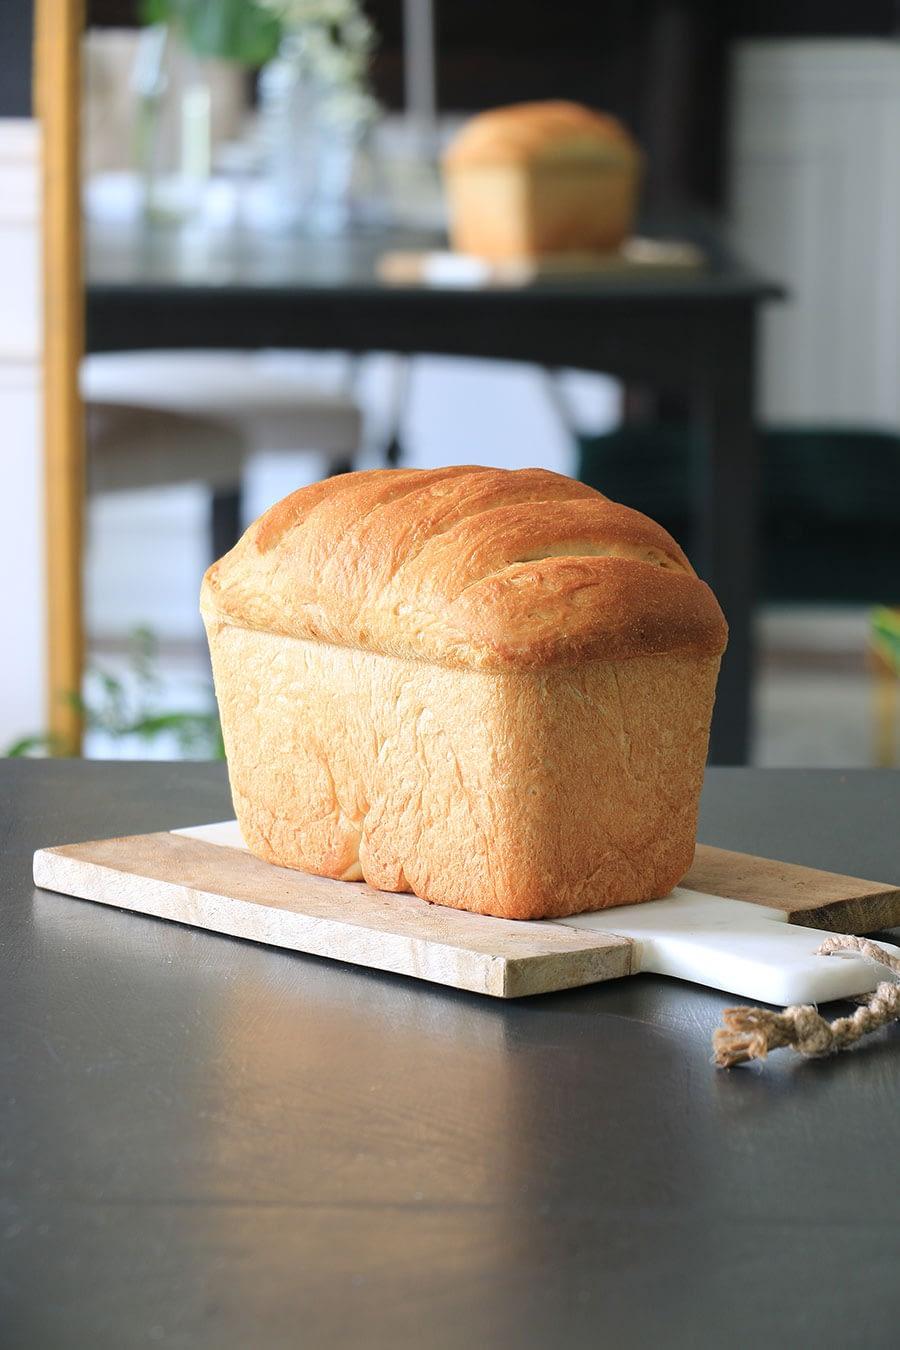 homemade bread with ridges